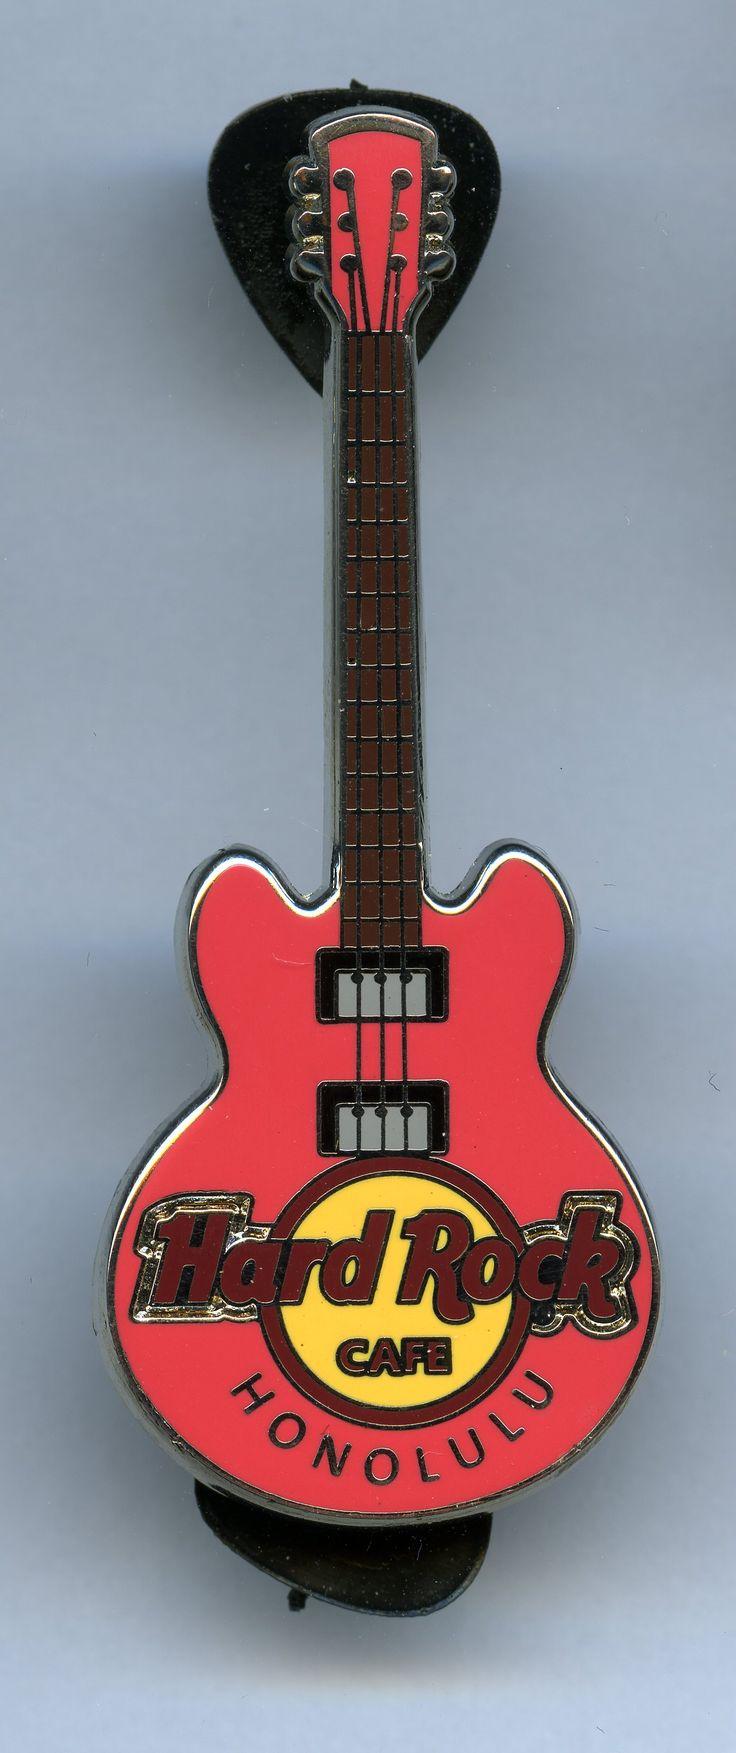 Honolulu - Hard Rock Cafe Guitar Pin